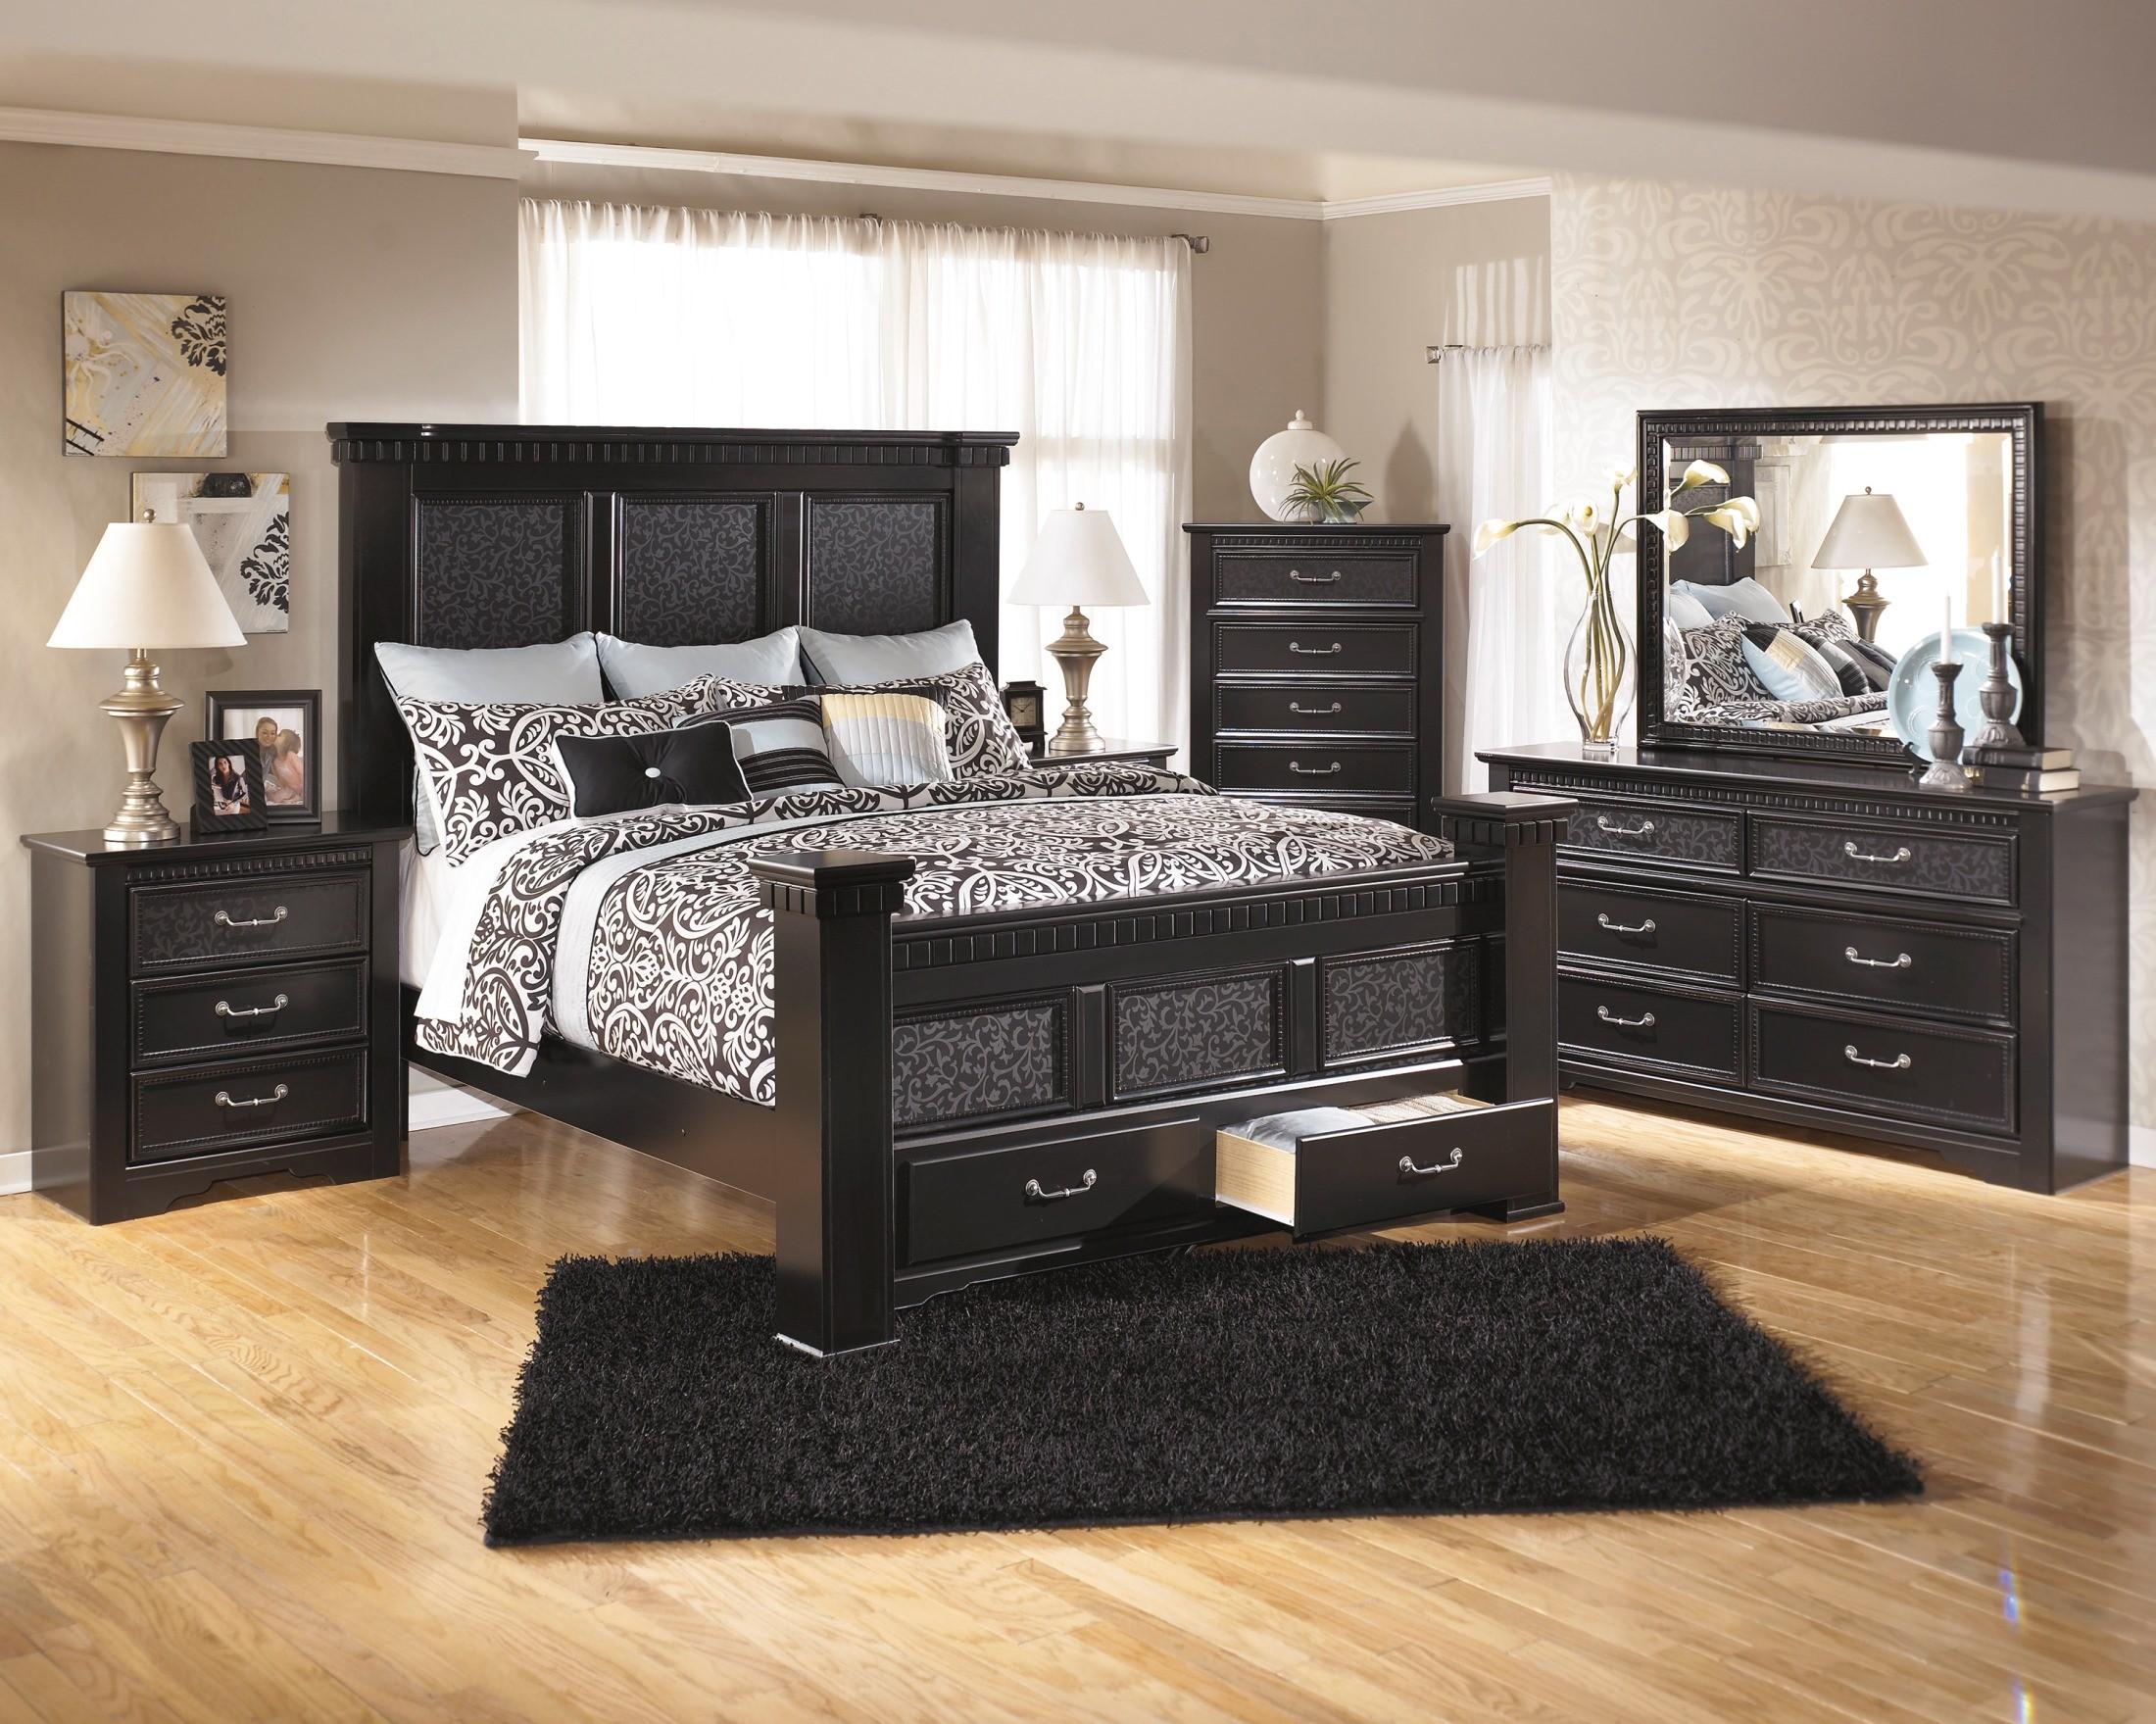 Royal Furniture Living Room Sets Cavallino Mansion Storage Bedroom Set From Ashley B291 Coleman